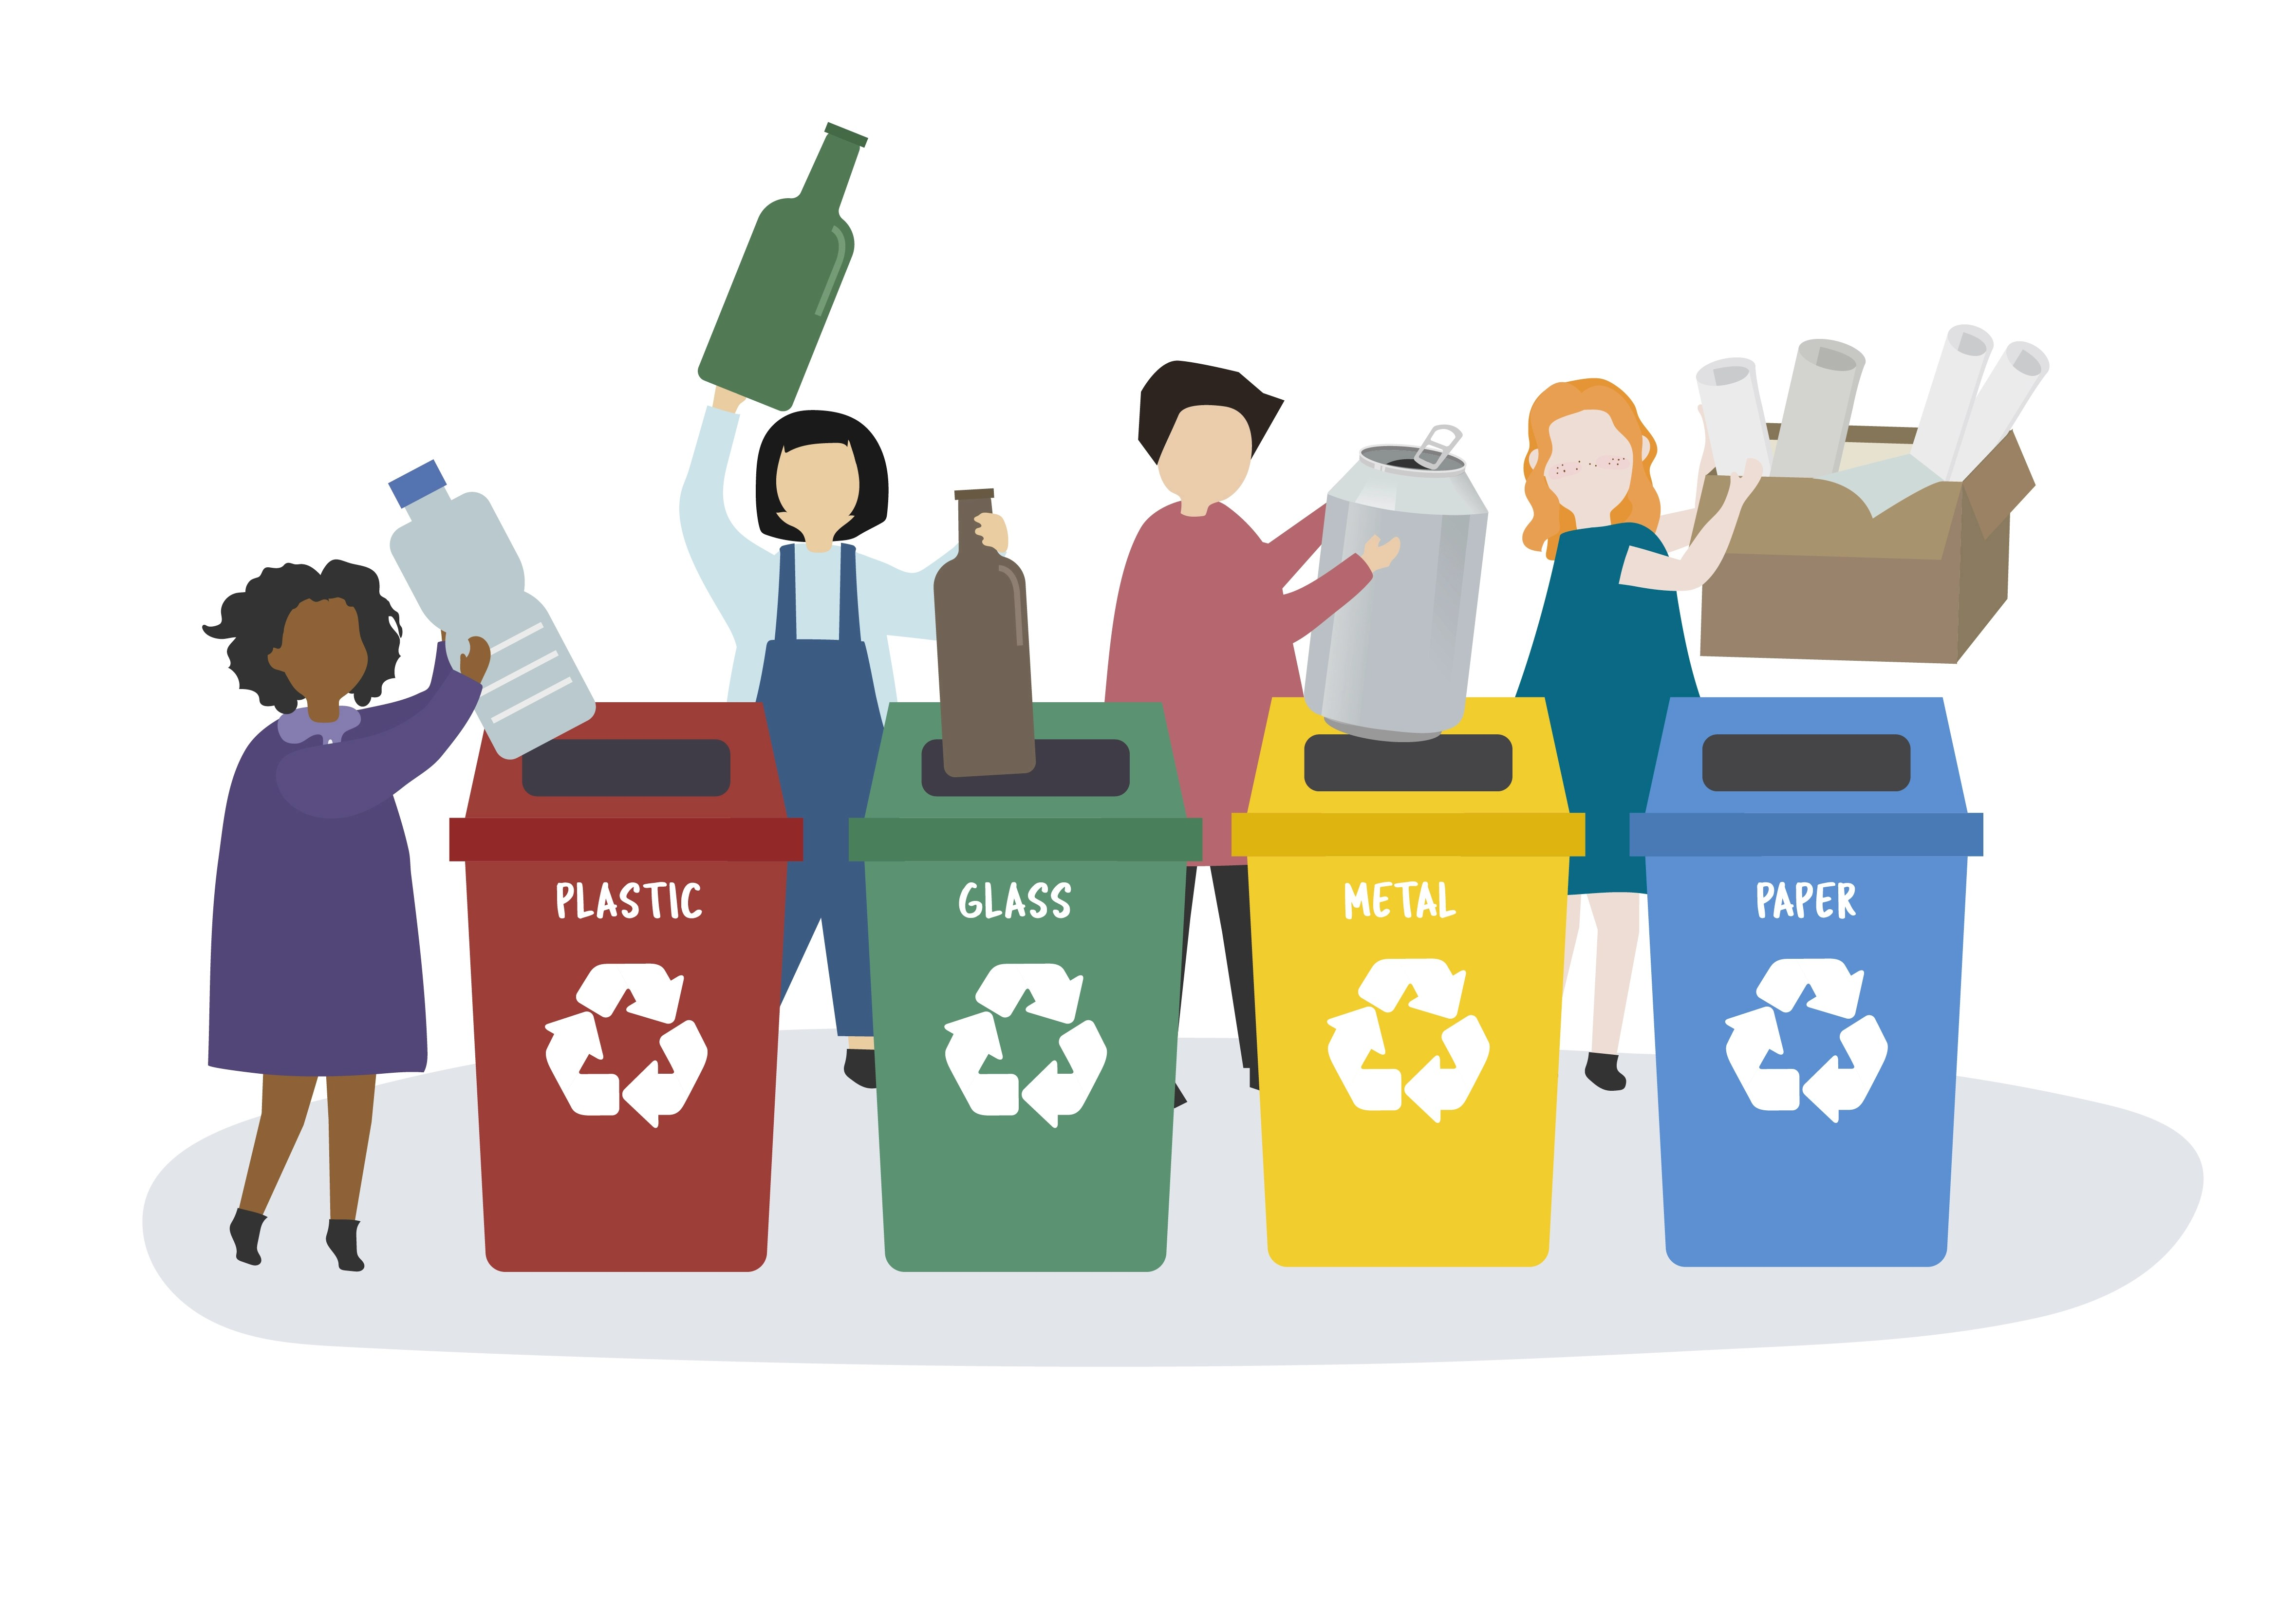 People Sorting Garbage Into Recycle Bins